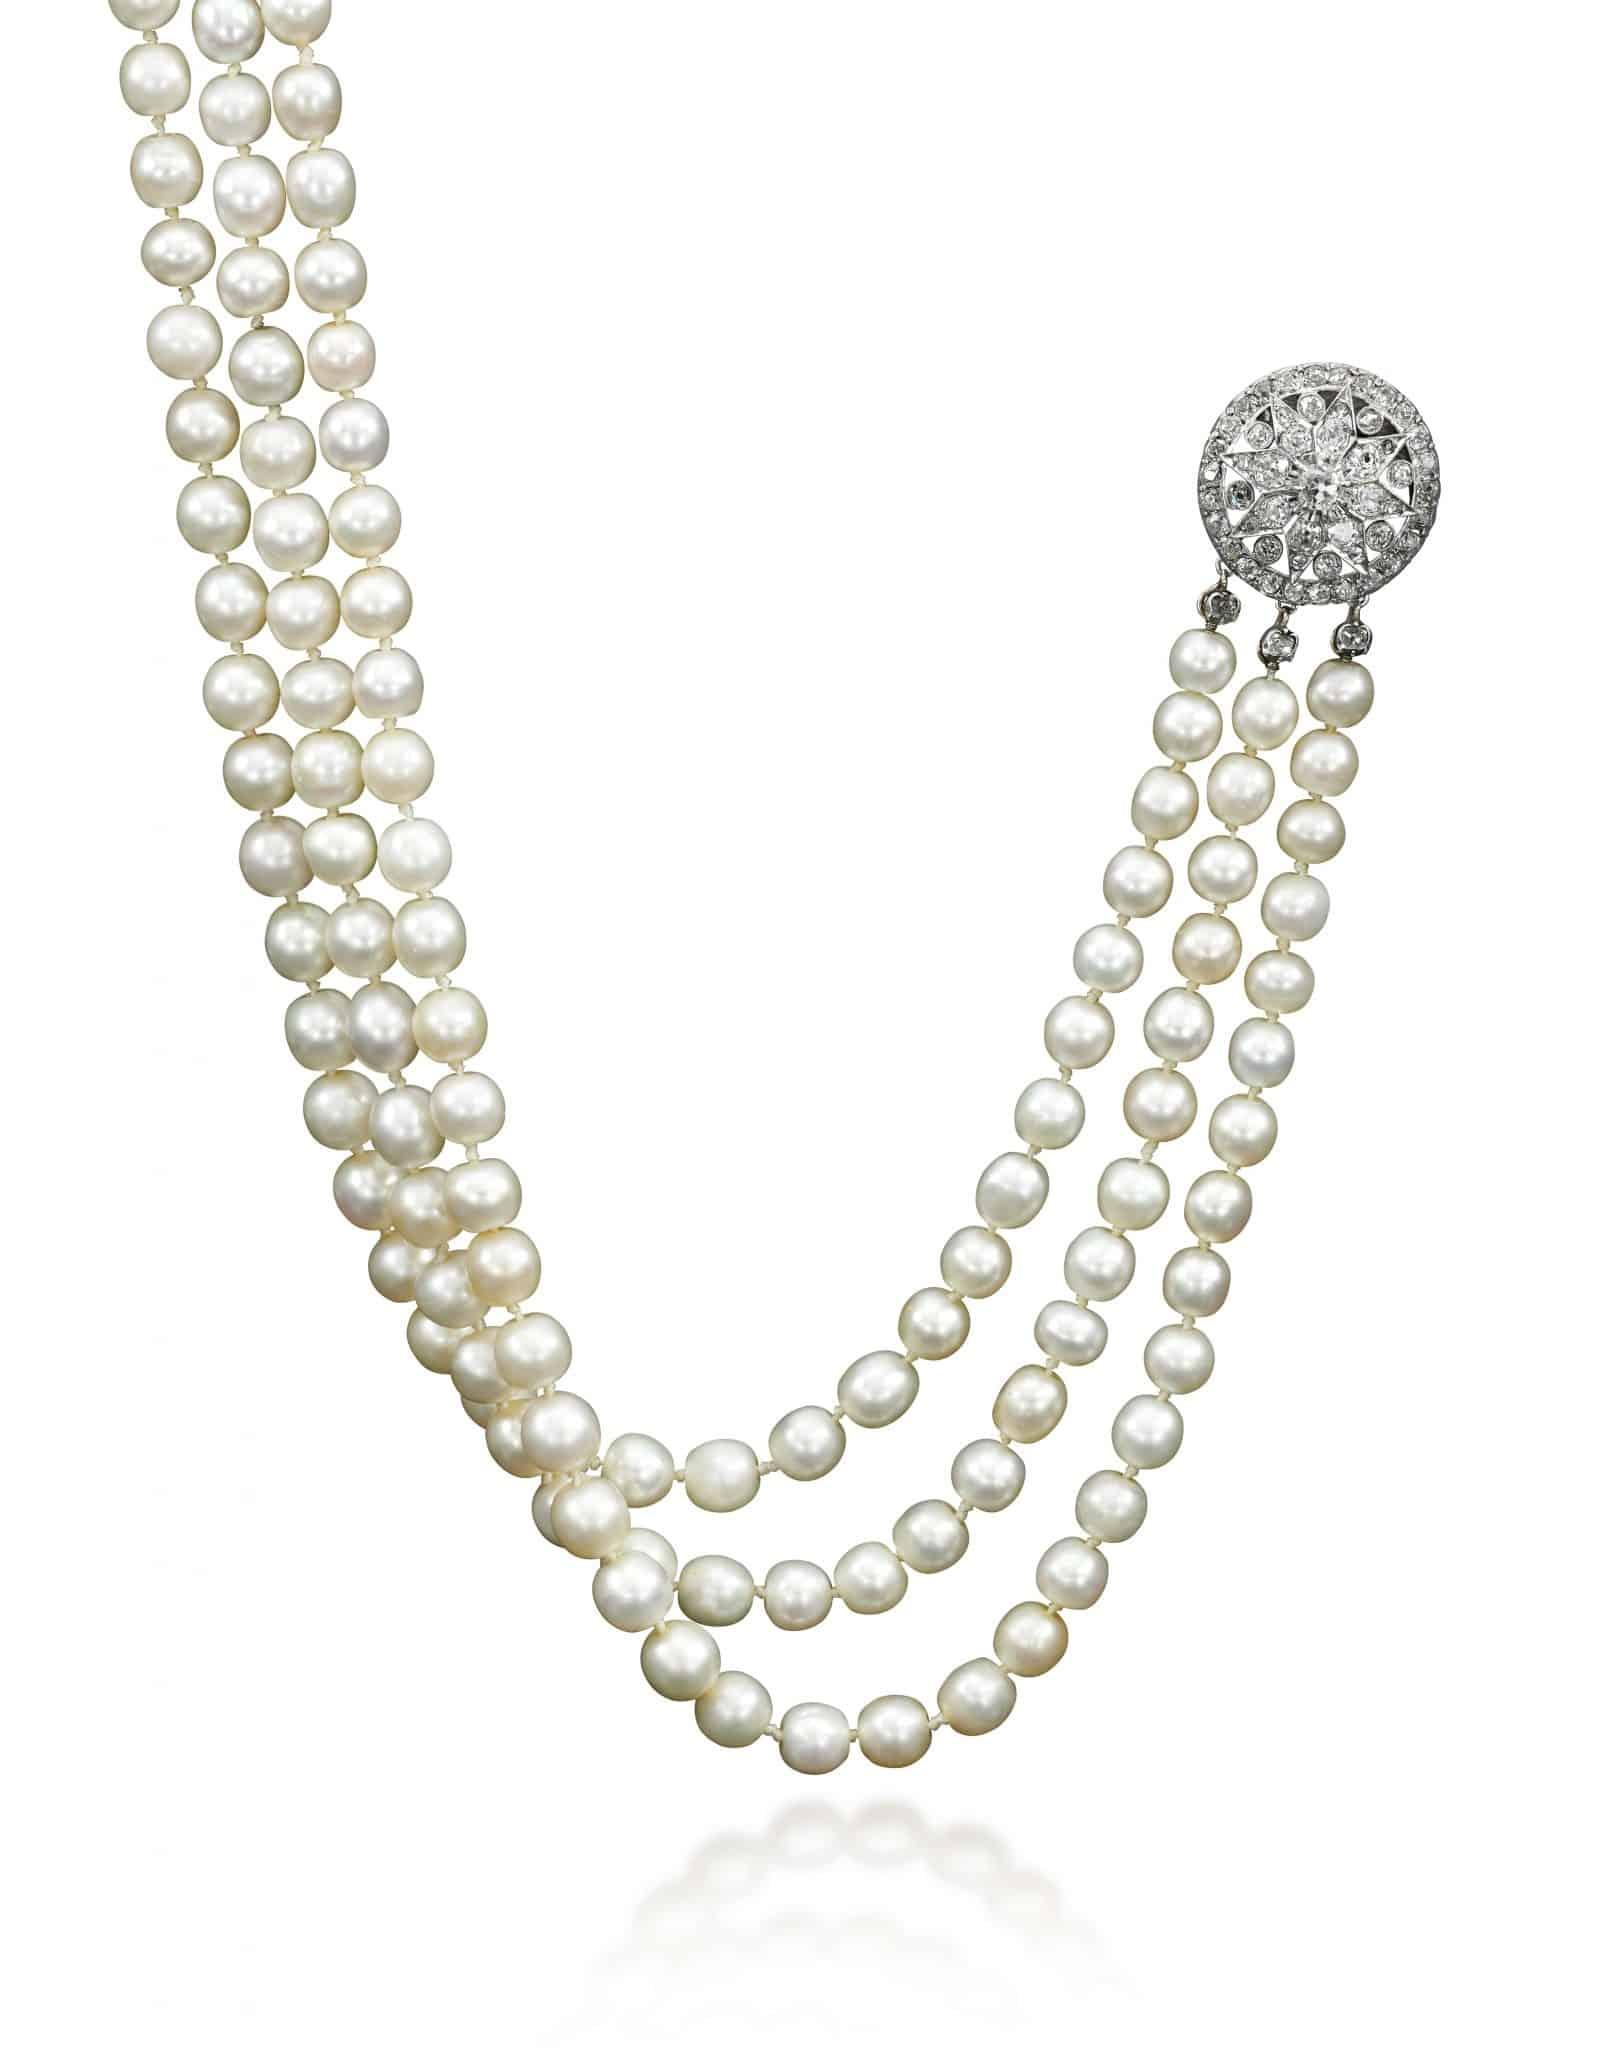 collier de Marie-Antoinette